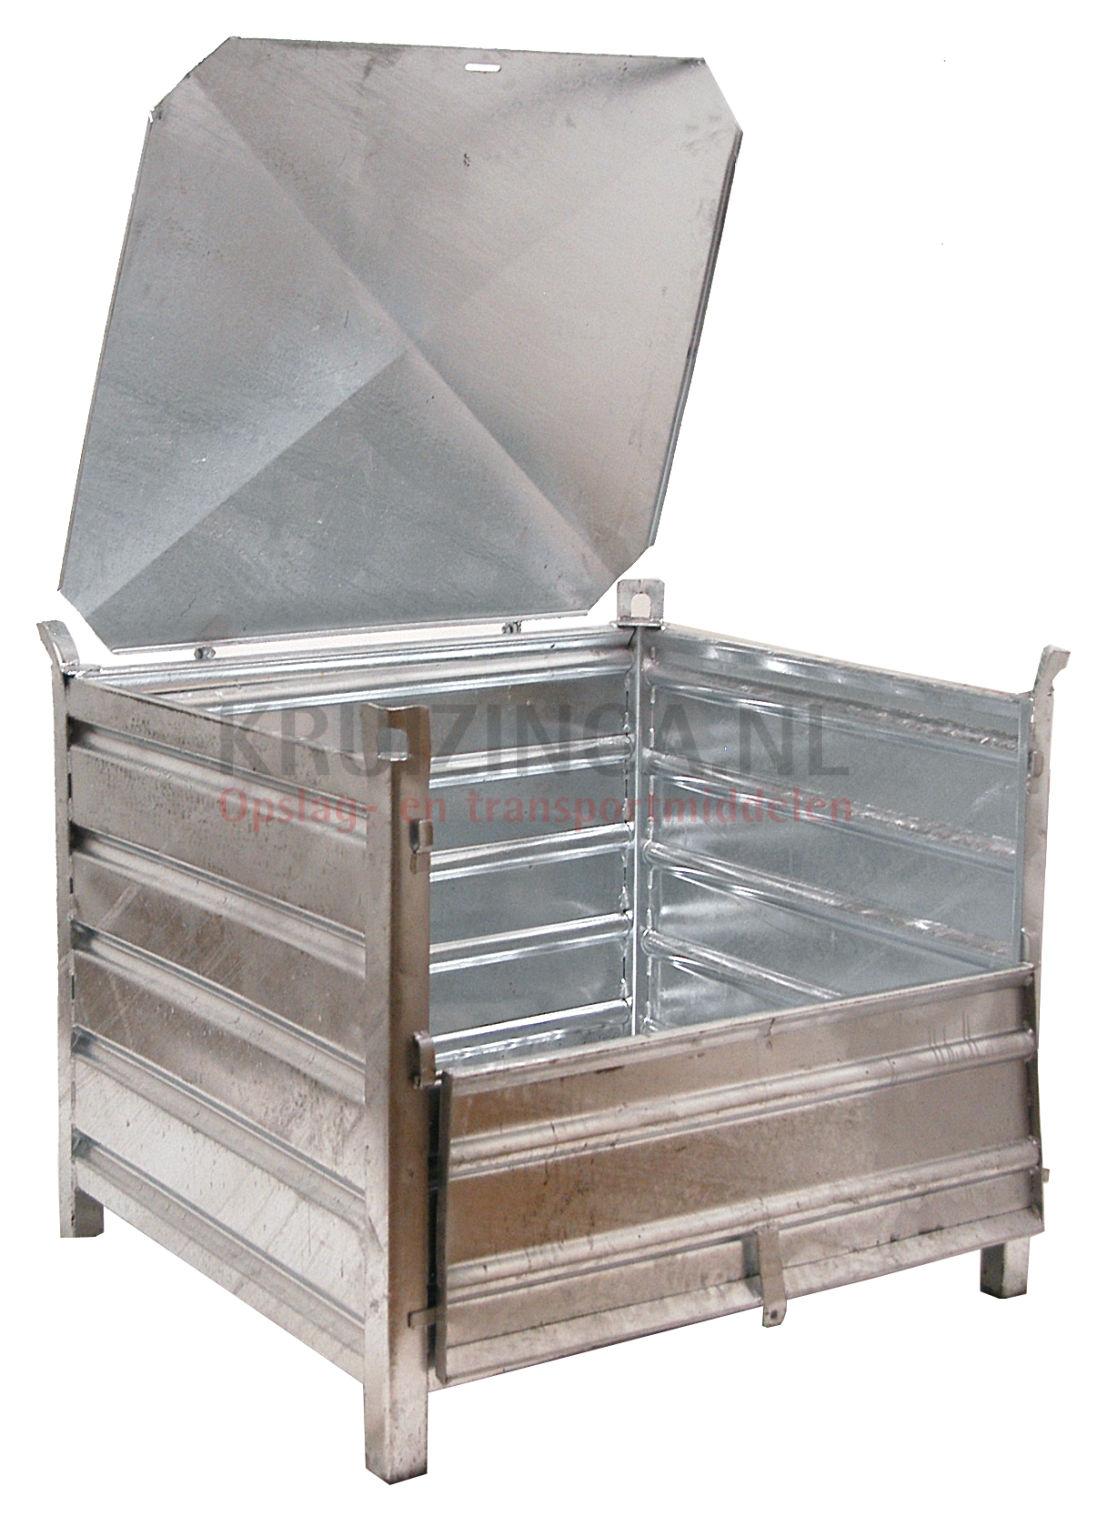 stapelboxen stahl feste konstruktion stapelbeh lter mit